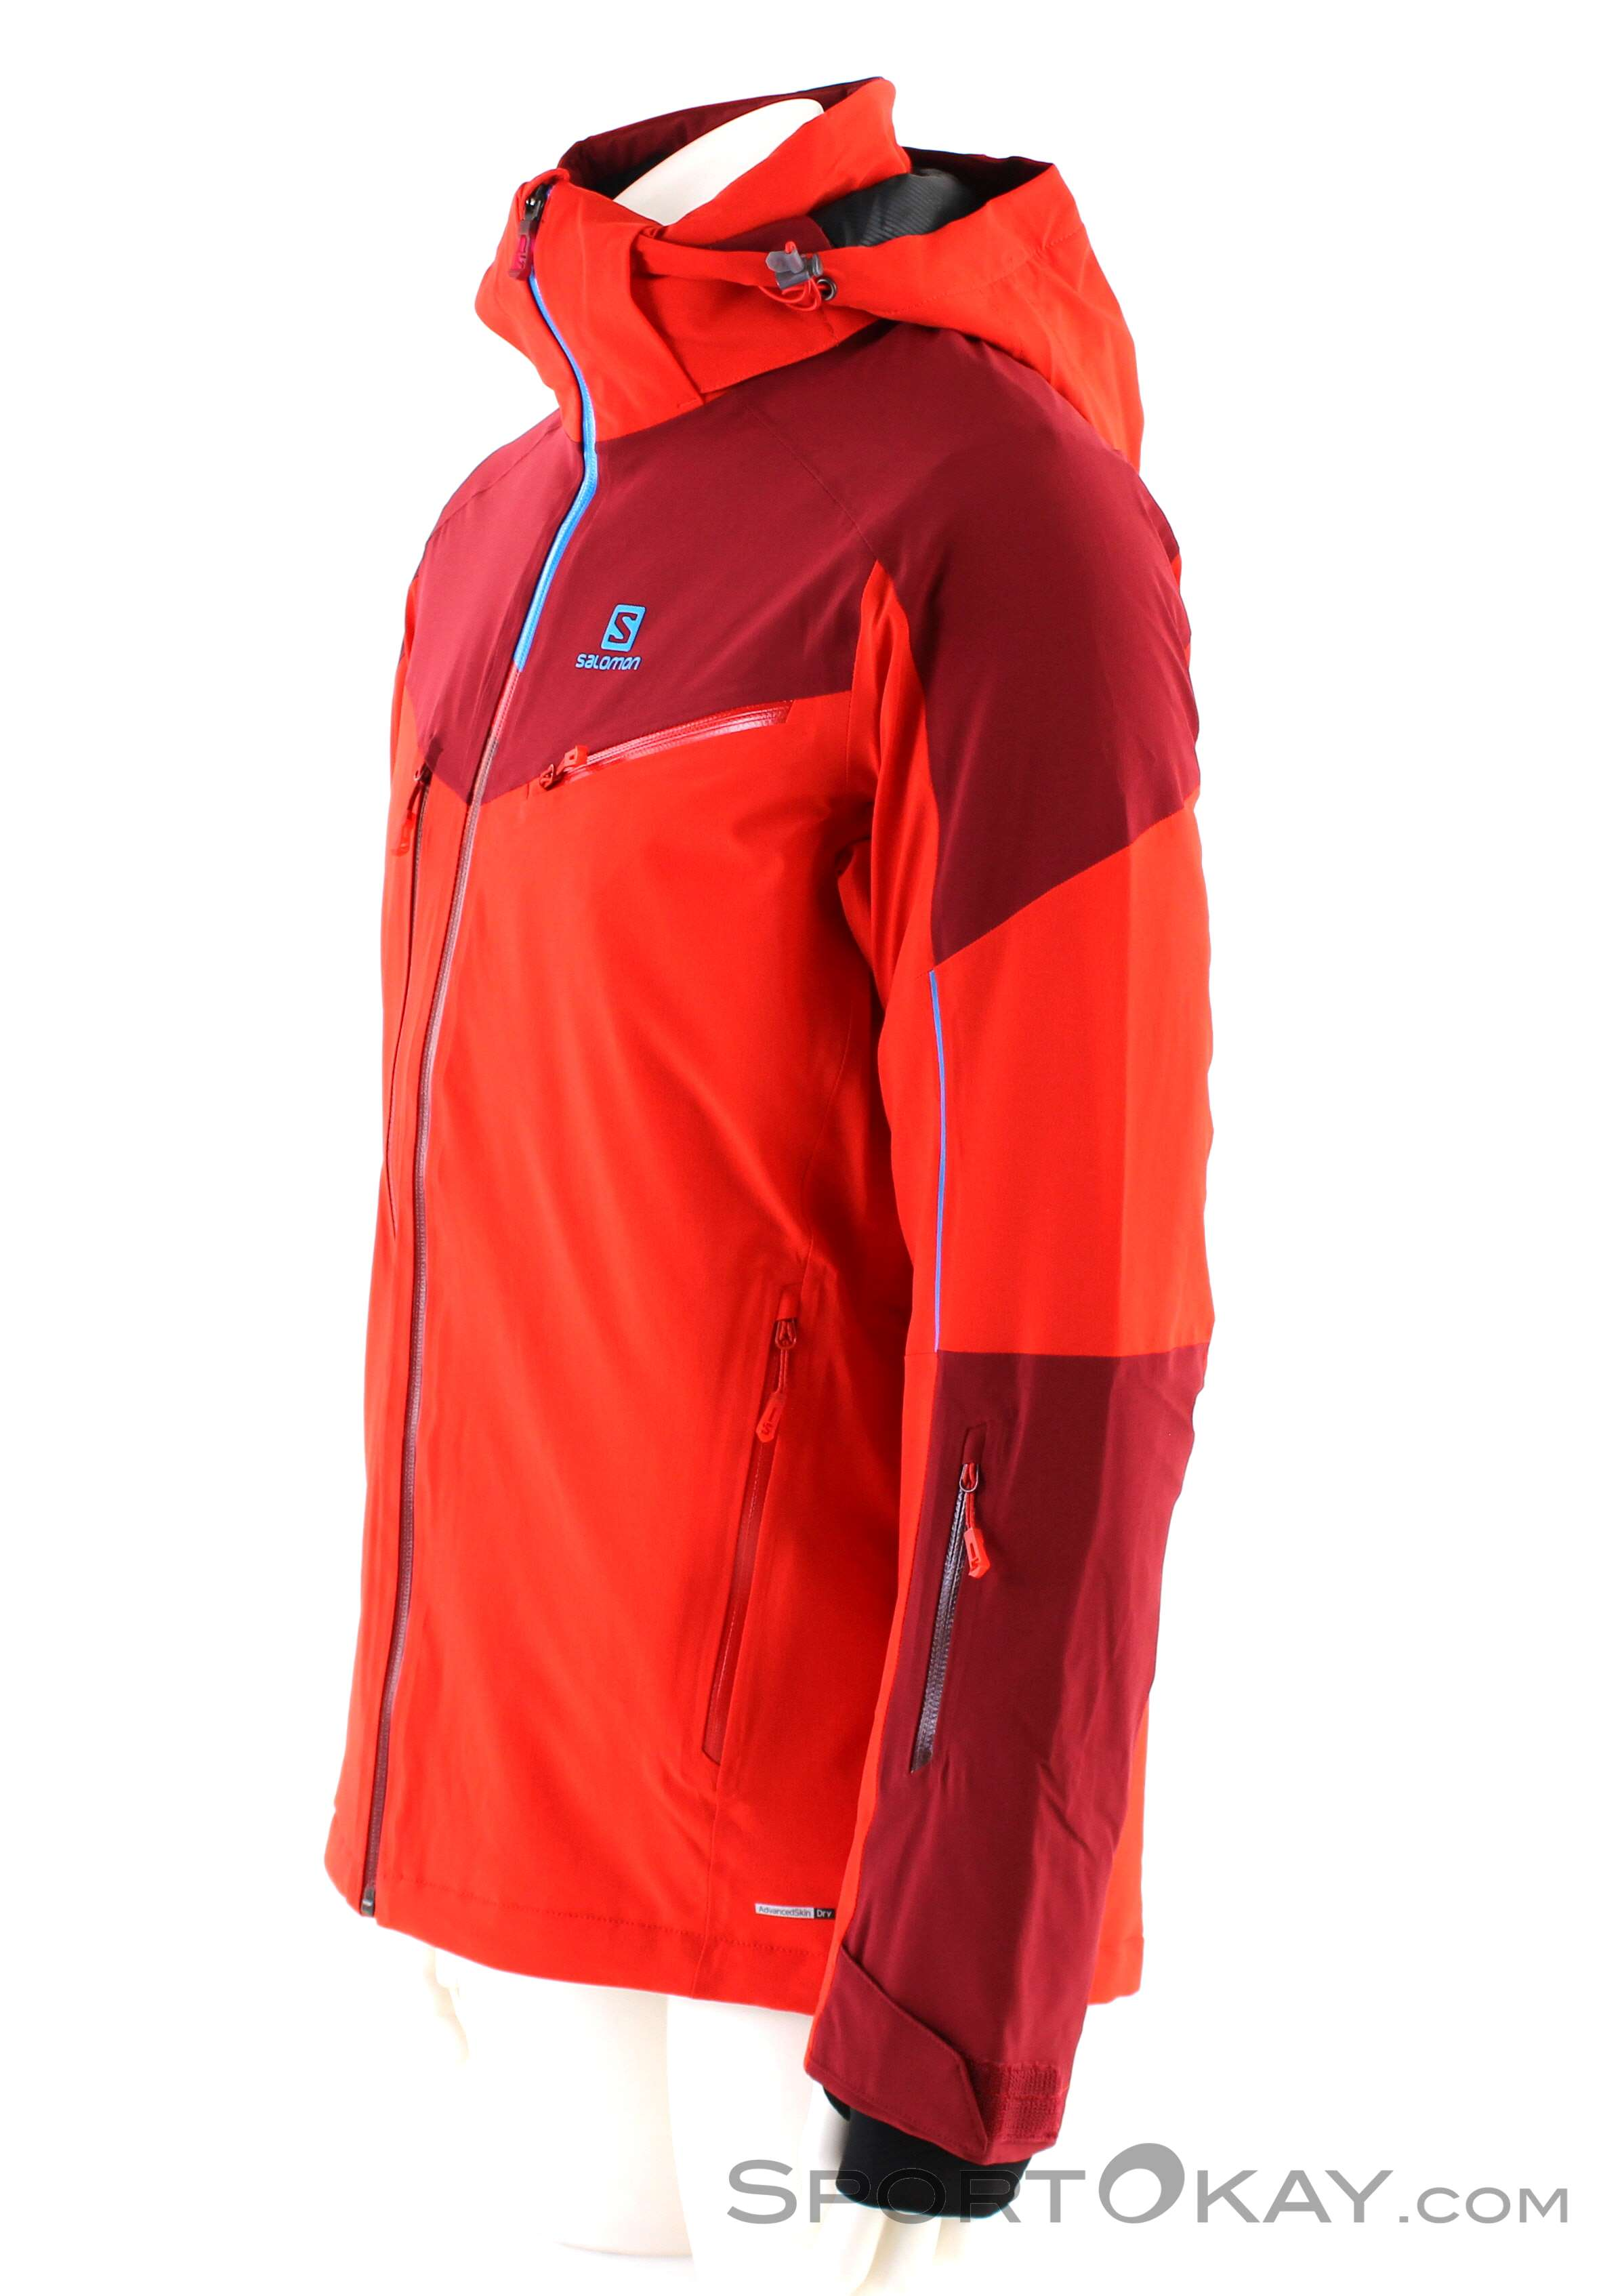 Salomon Icespeed Jacket Mens Ski Jacket Ski Jackets Ski